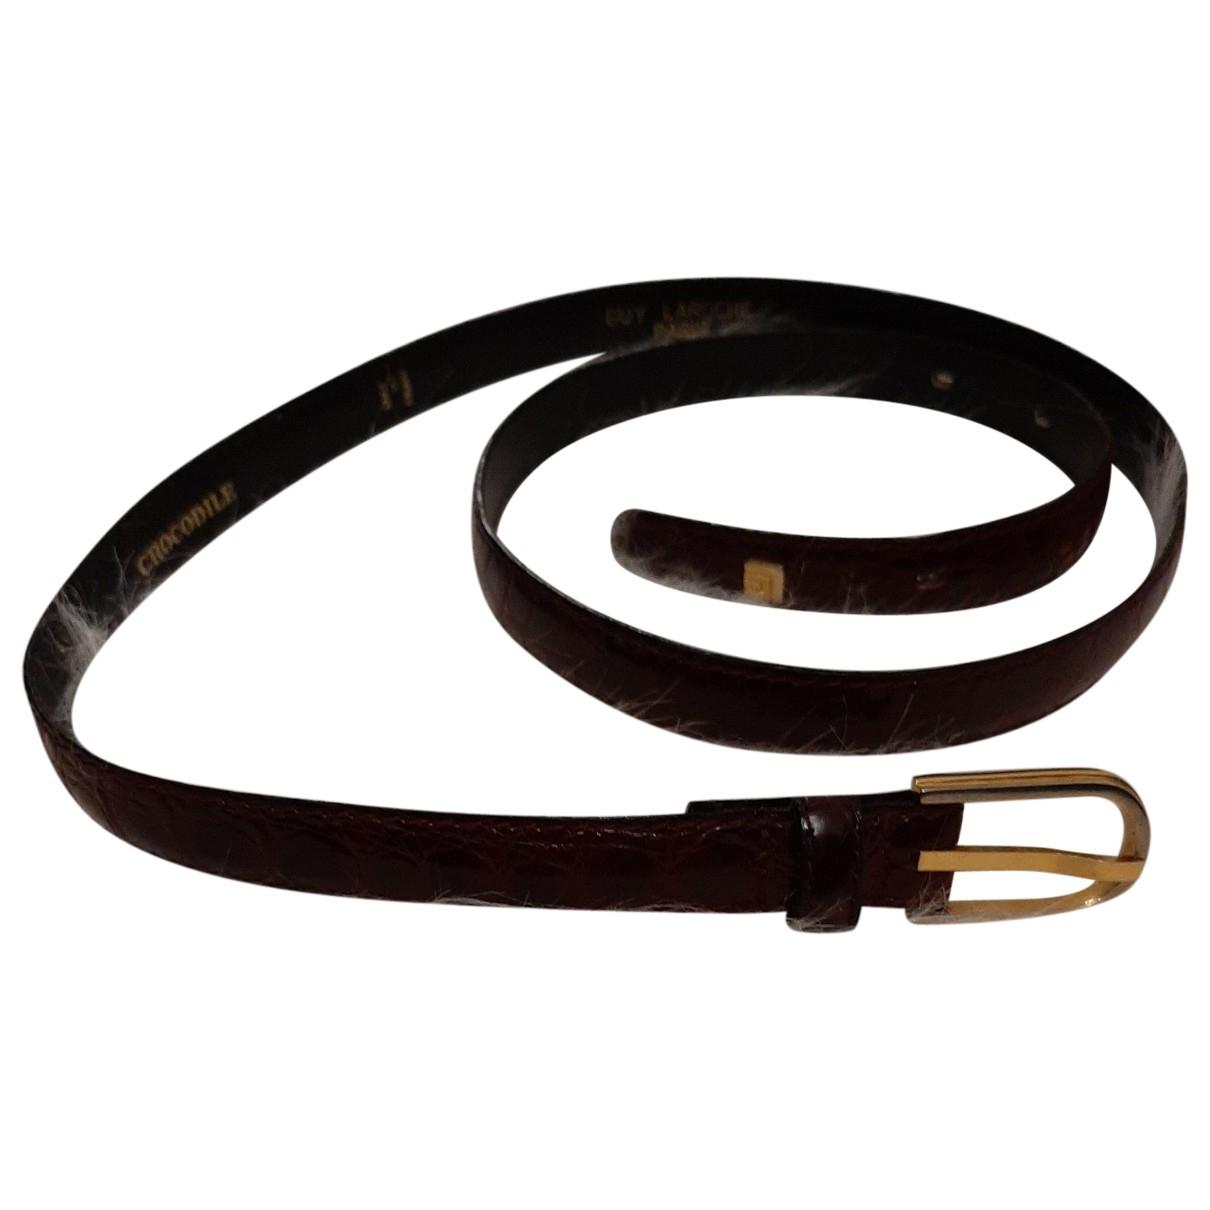 Cinturon de Cuero Guy Laroche